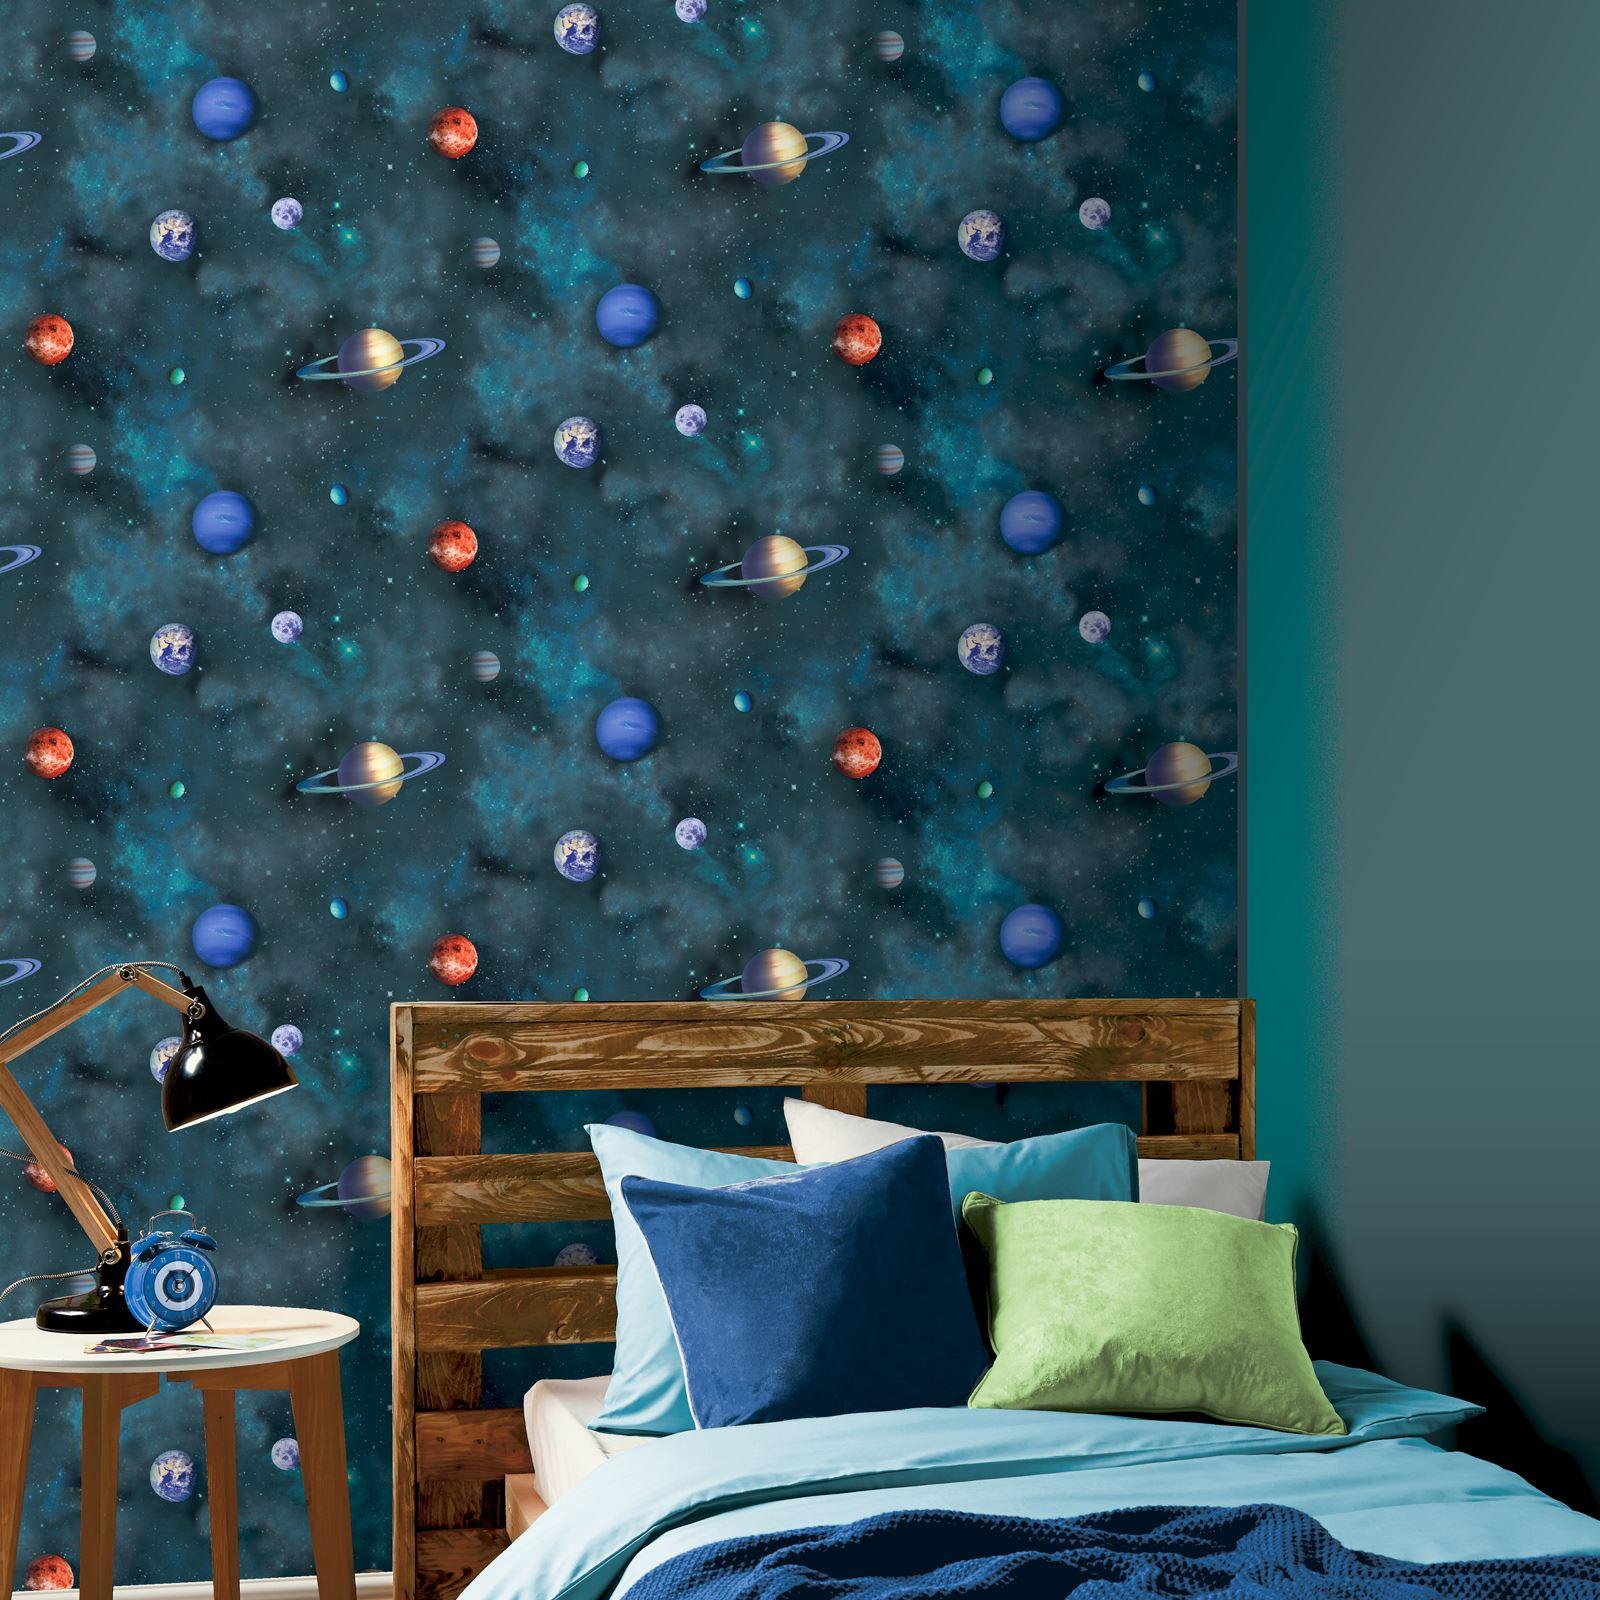 ARTHOUSE-GLITTER-DETAIL-KIDS-WALLPAPER-BEDROOM-UNICORN-MERMAID-SPACE thumbnail 71